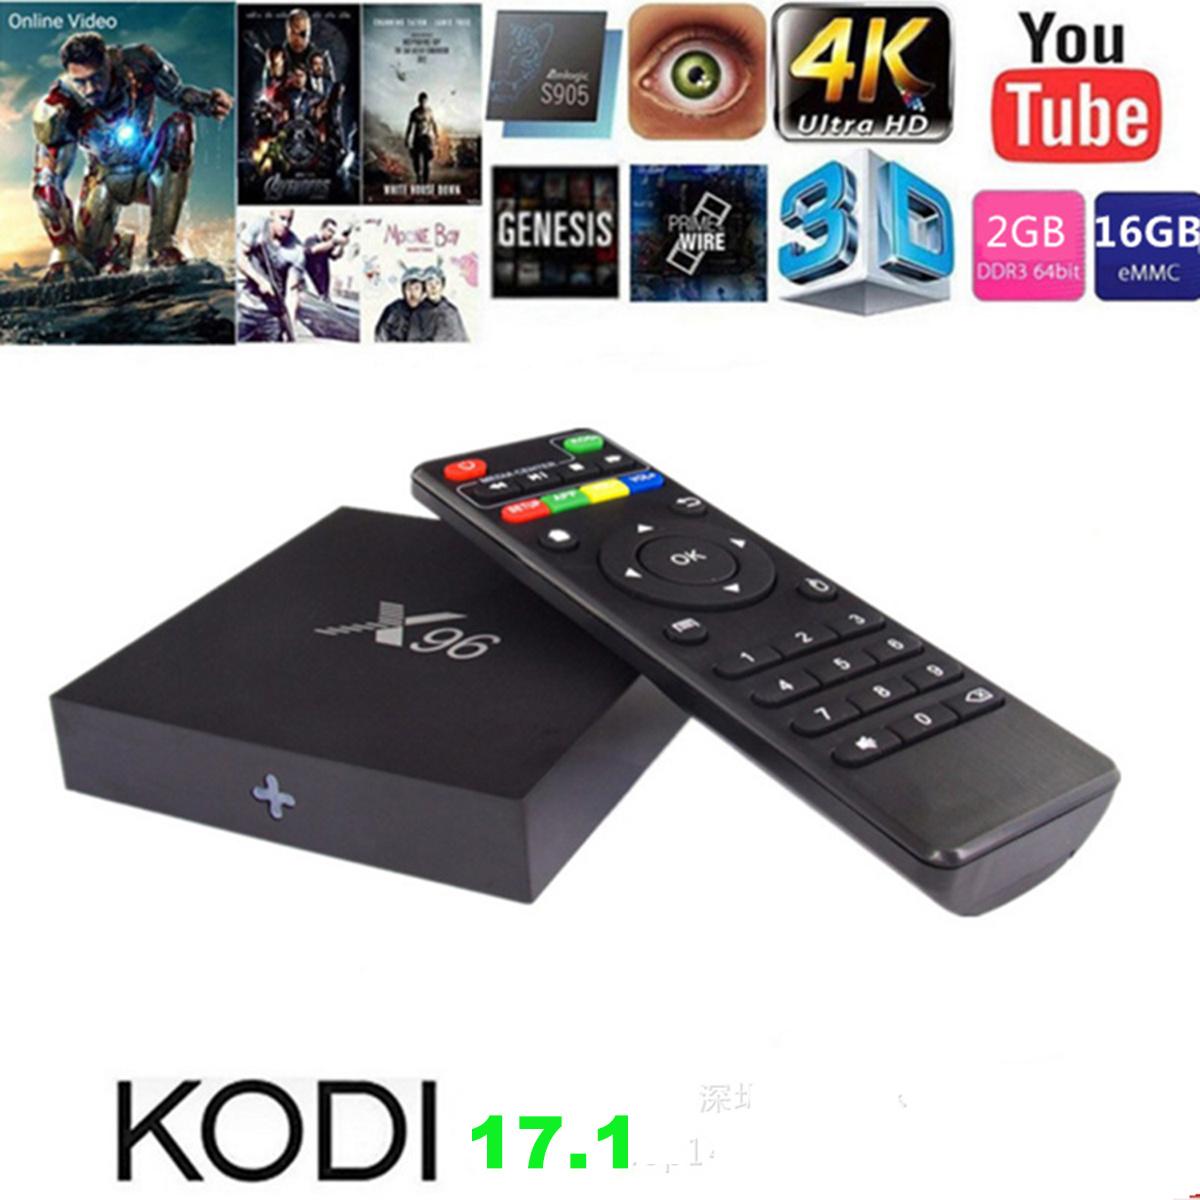 New Model S905X 2GB 16GB Smart TV Box Android 6.0 Live Streaming Ott TV Box Set Top Box